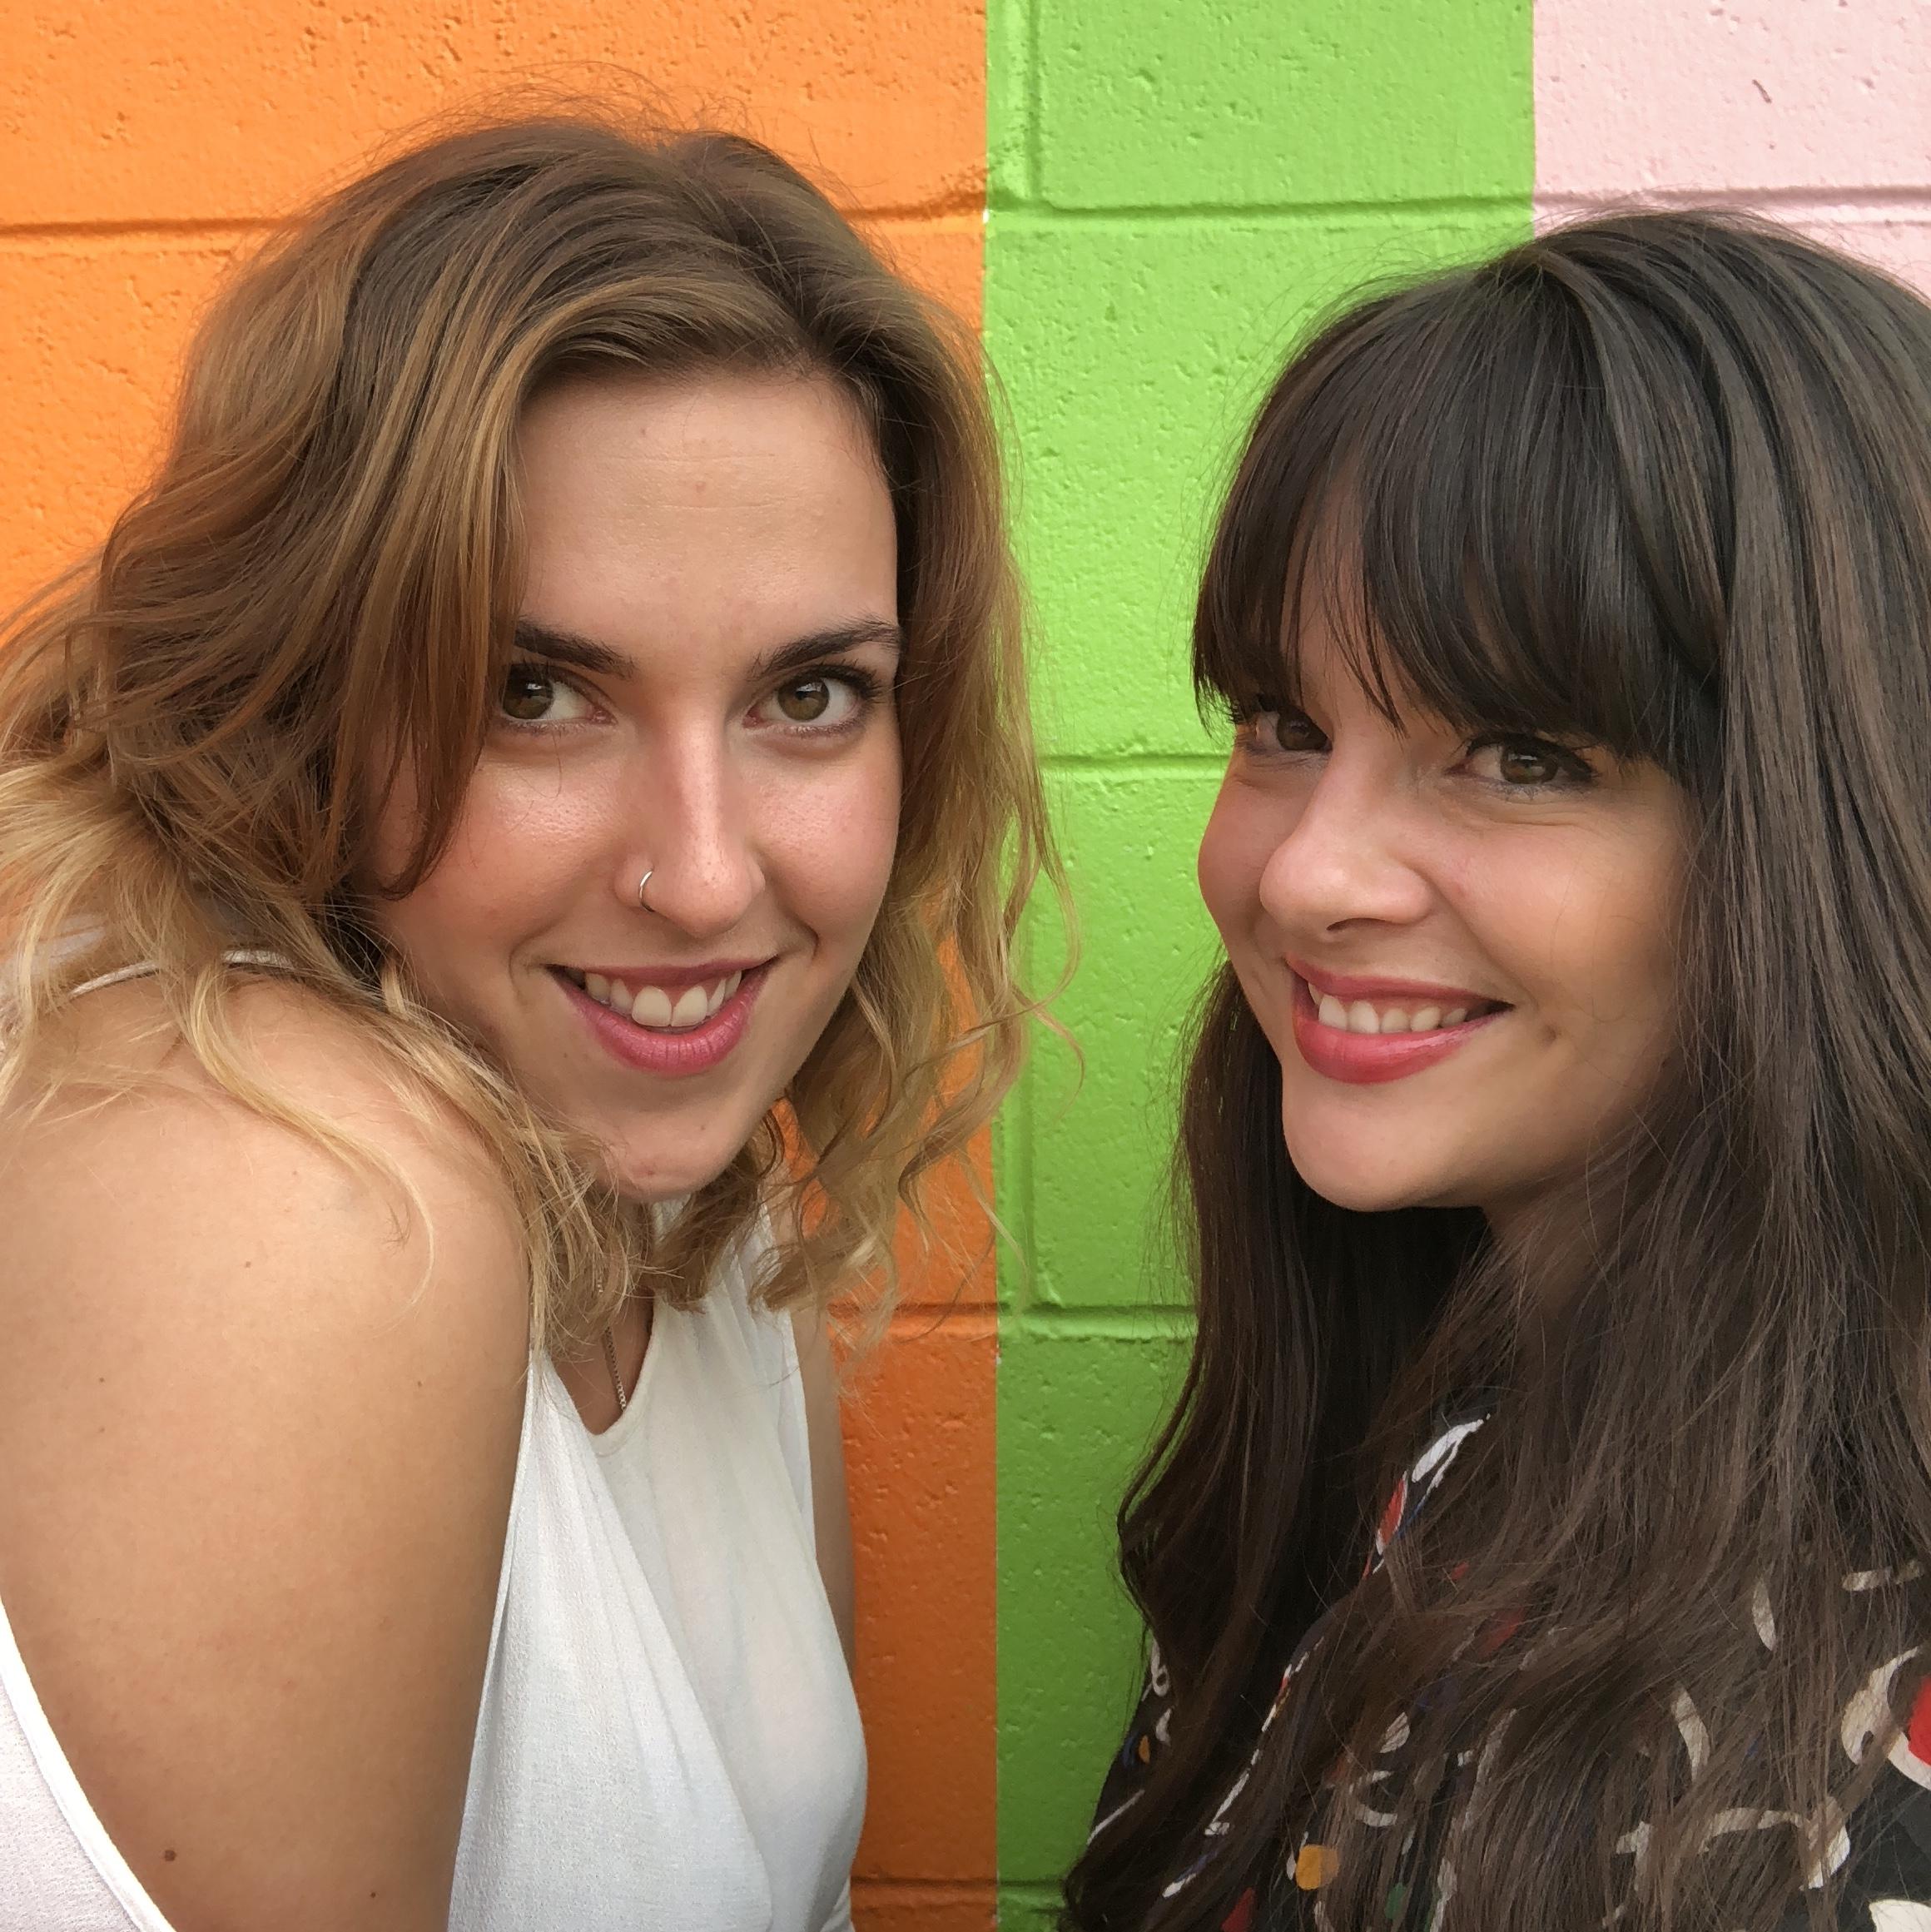 Sasha and her #ThisIsAna co-conspirator, Athena Russel.